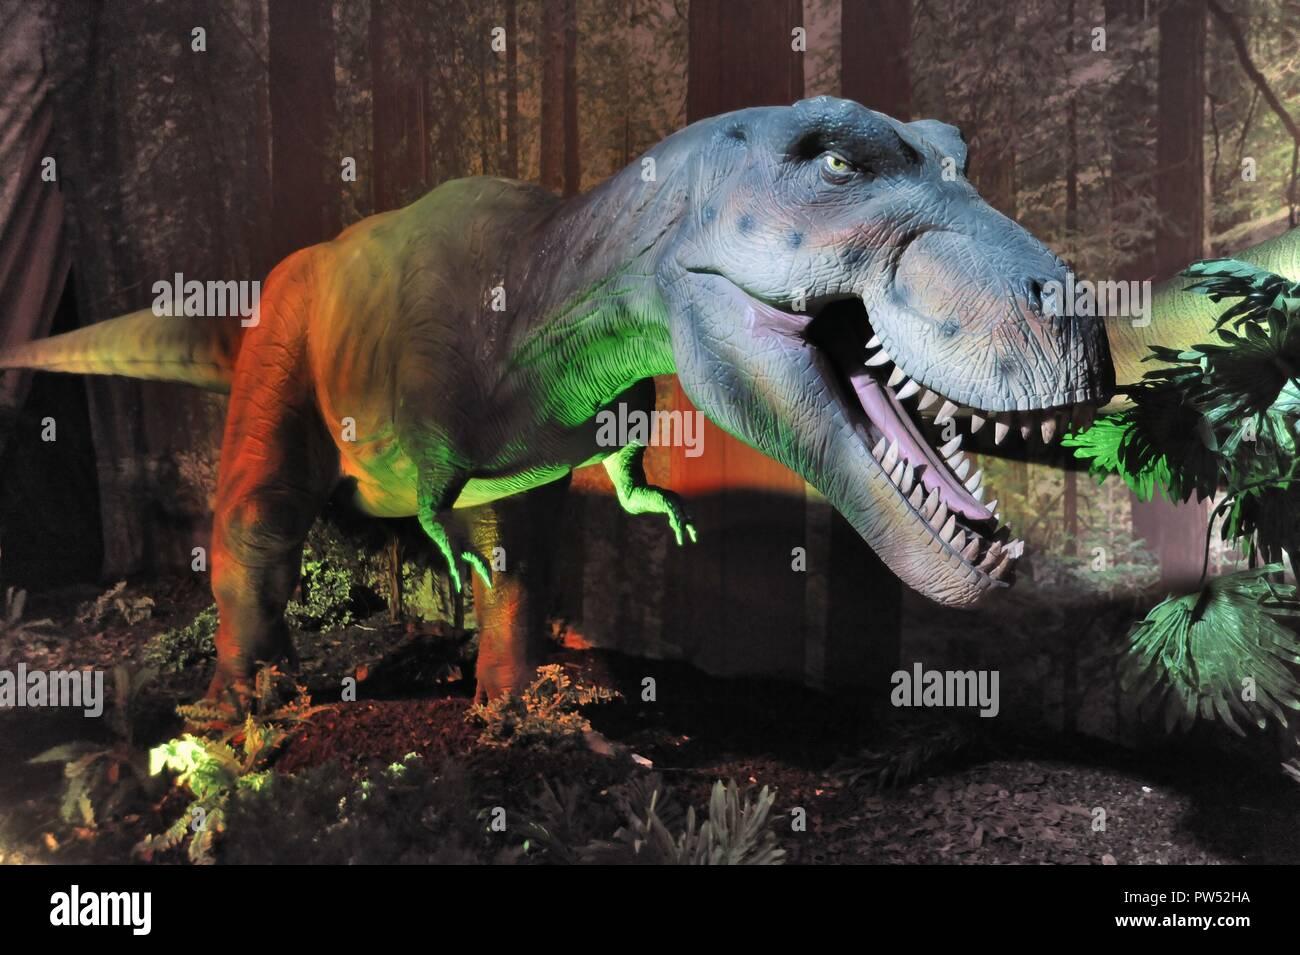 Milan (Italy), exhibition of prehistoric animals reproduced in full size; Tyrannosaurus (Tyrannosaurus rex) - Stock Image